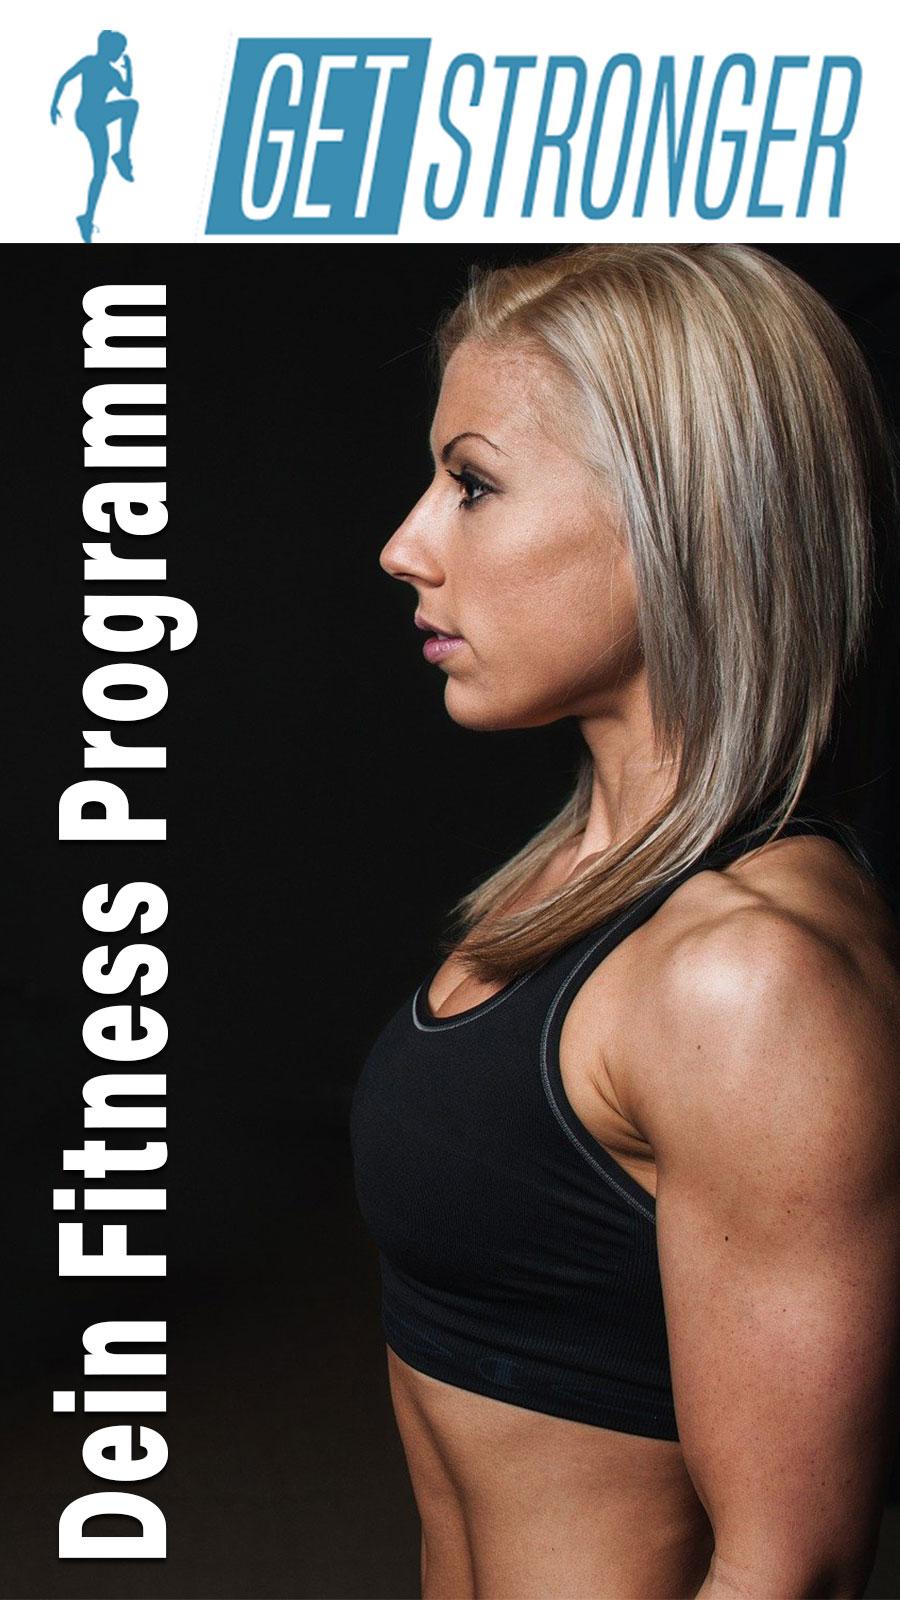 Dein Fitnessprogramm - Getstronger